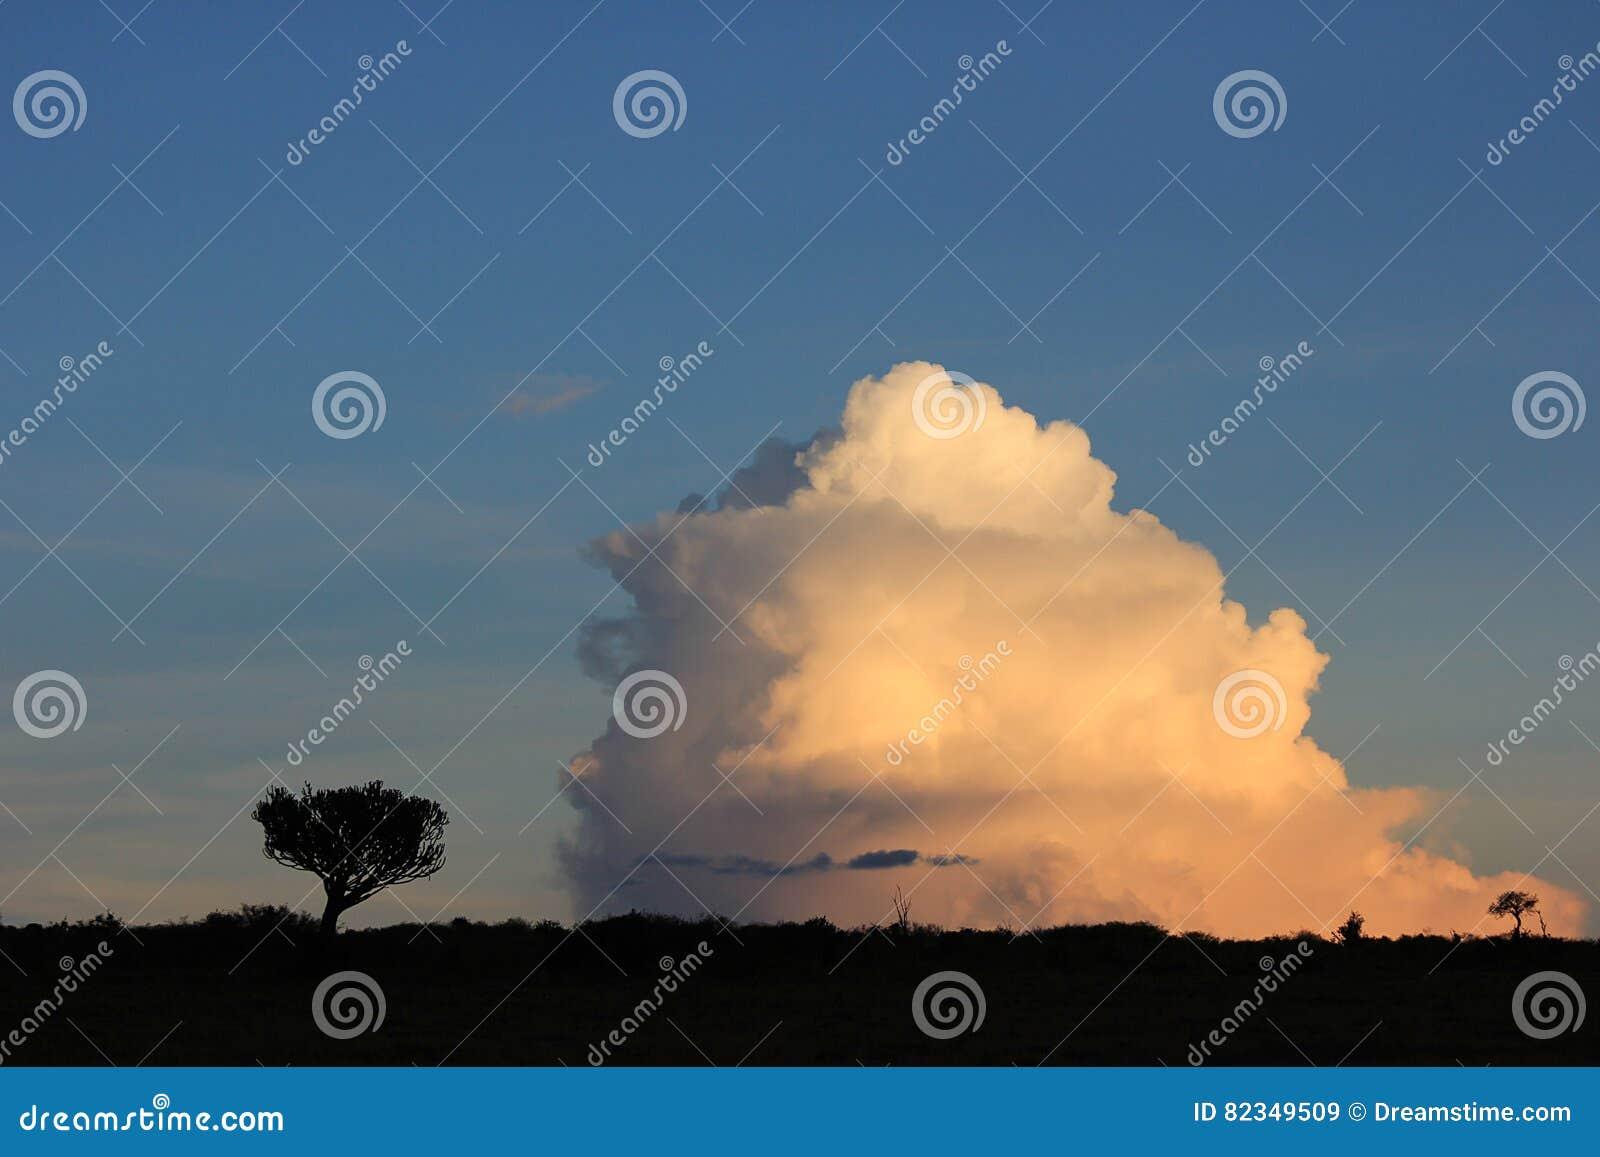 Drzewa versus chmury